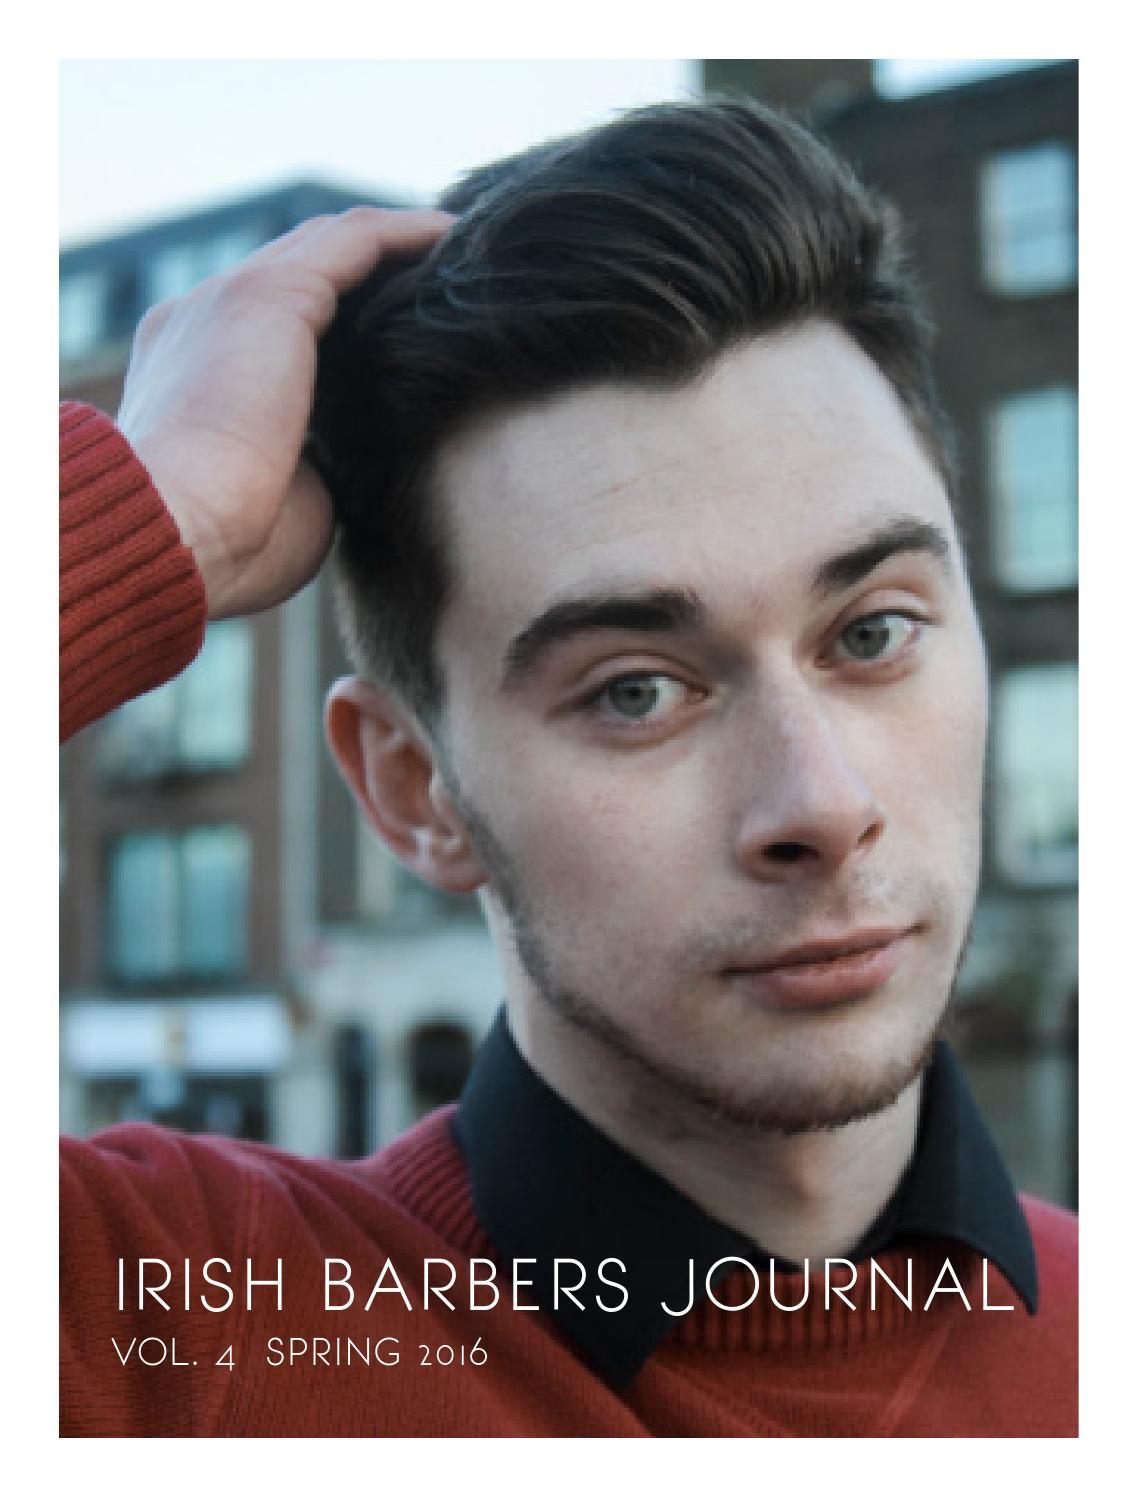 Irish Barbers Journal Volume 4 By Dublin School Of Barbering Issuu